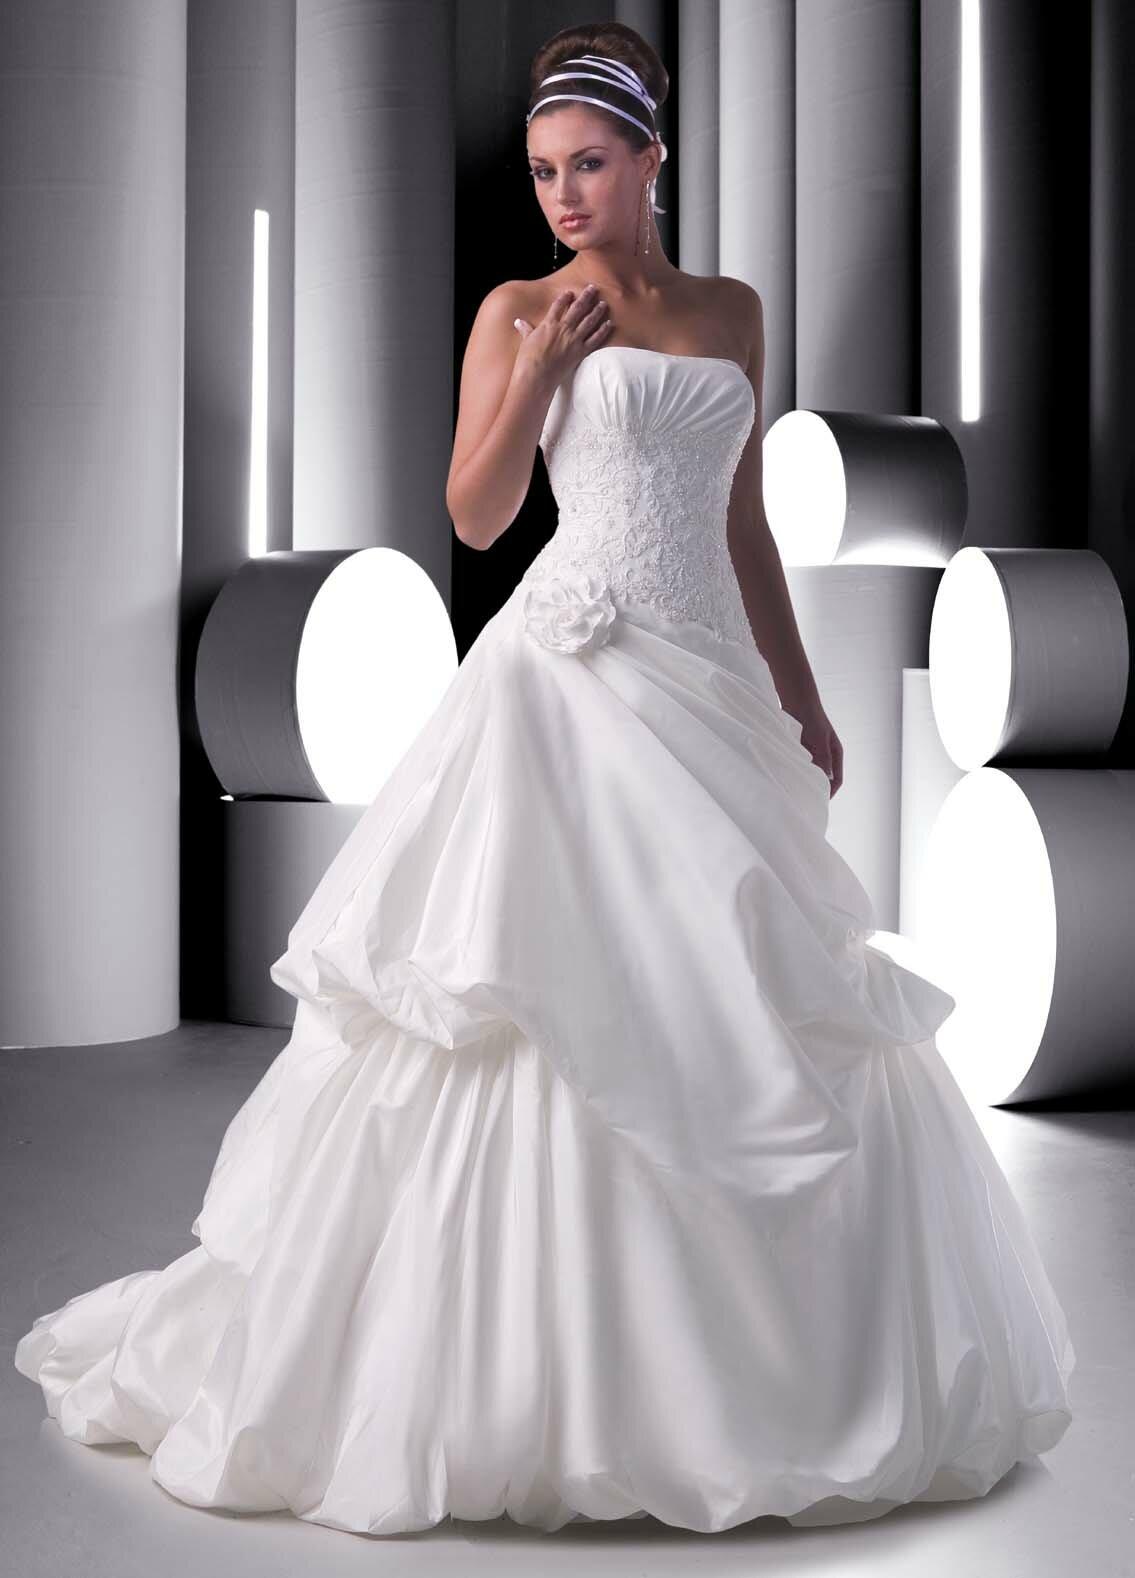 all white wedding dresses photo 6 all white wedding dress All white wedding dresses Photo 5